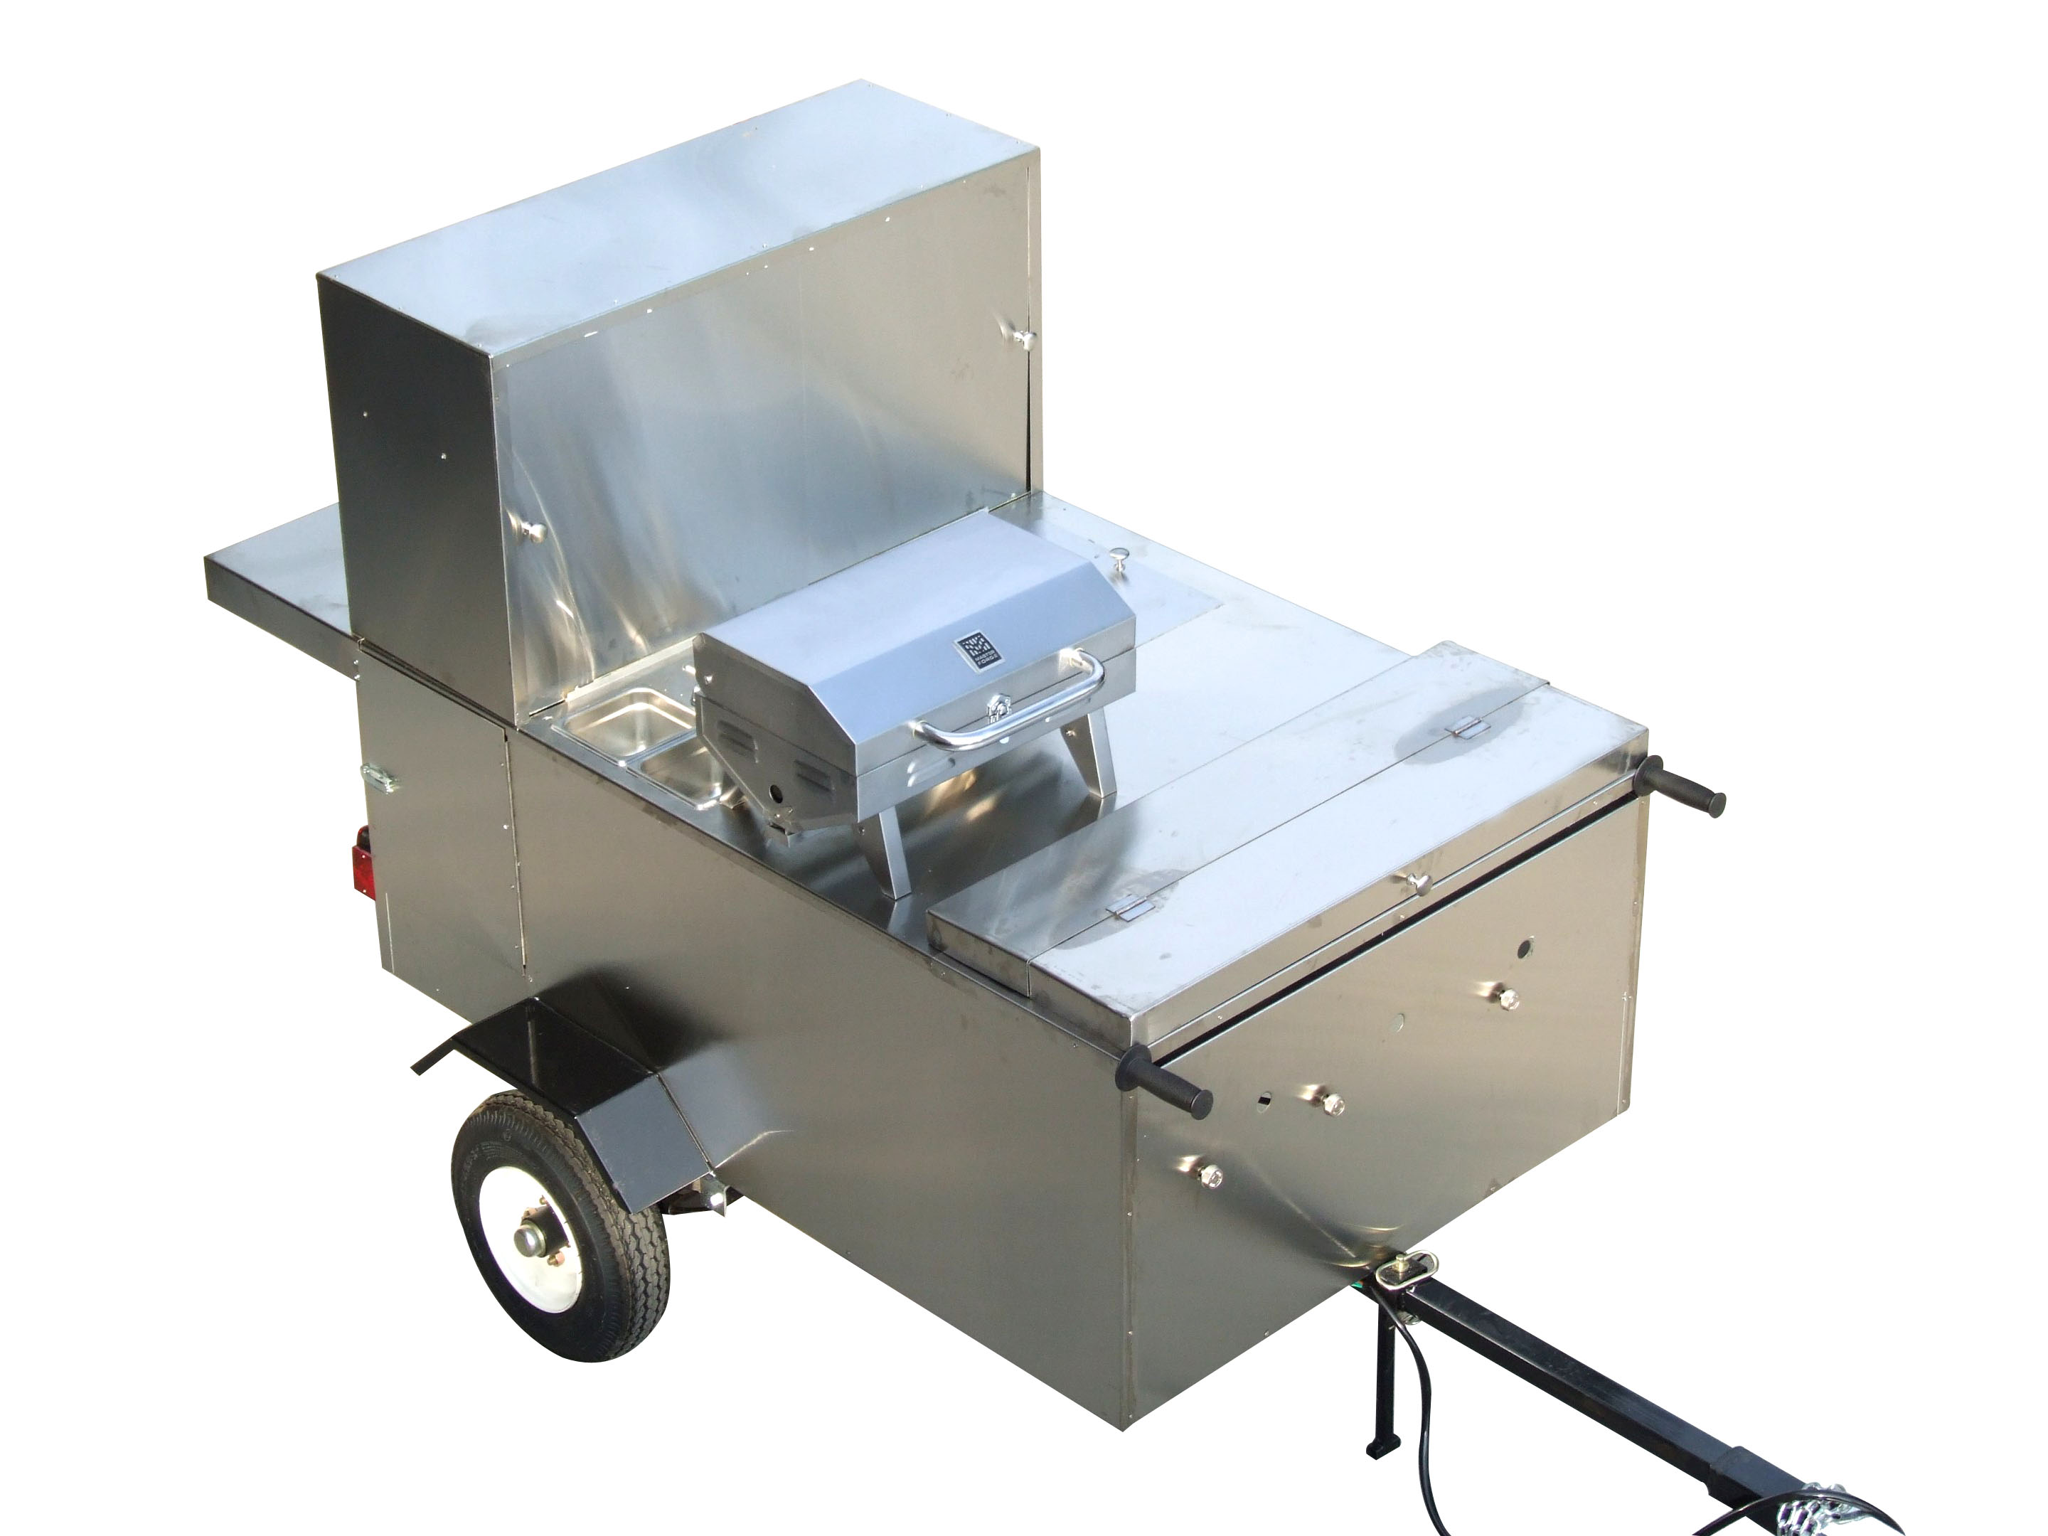 Best Hot Dog Cart - The Big Dog Hot Dog Cart Mini Mobile Kitchen